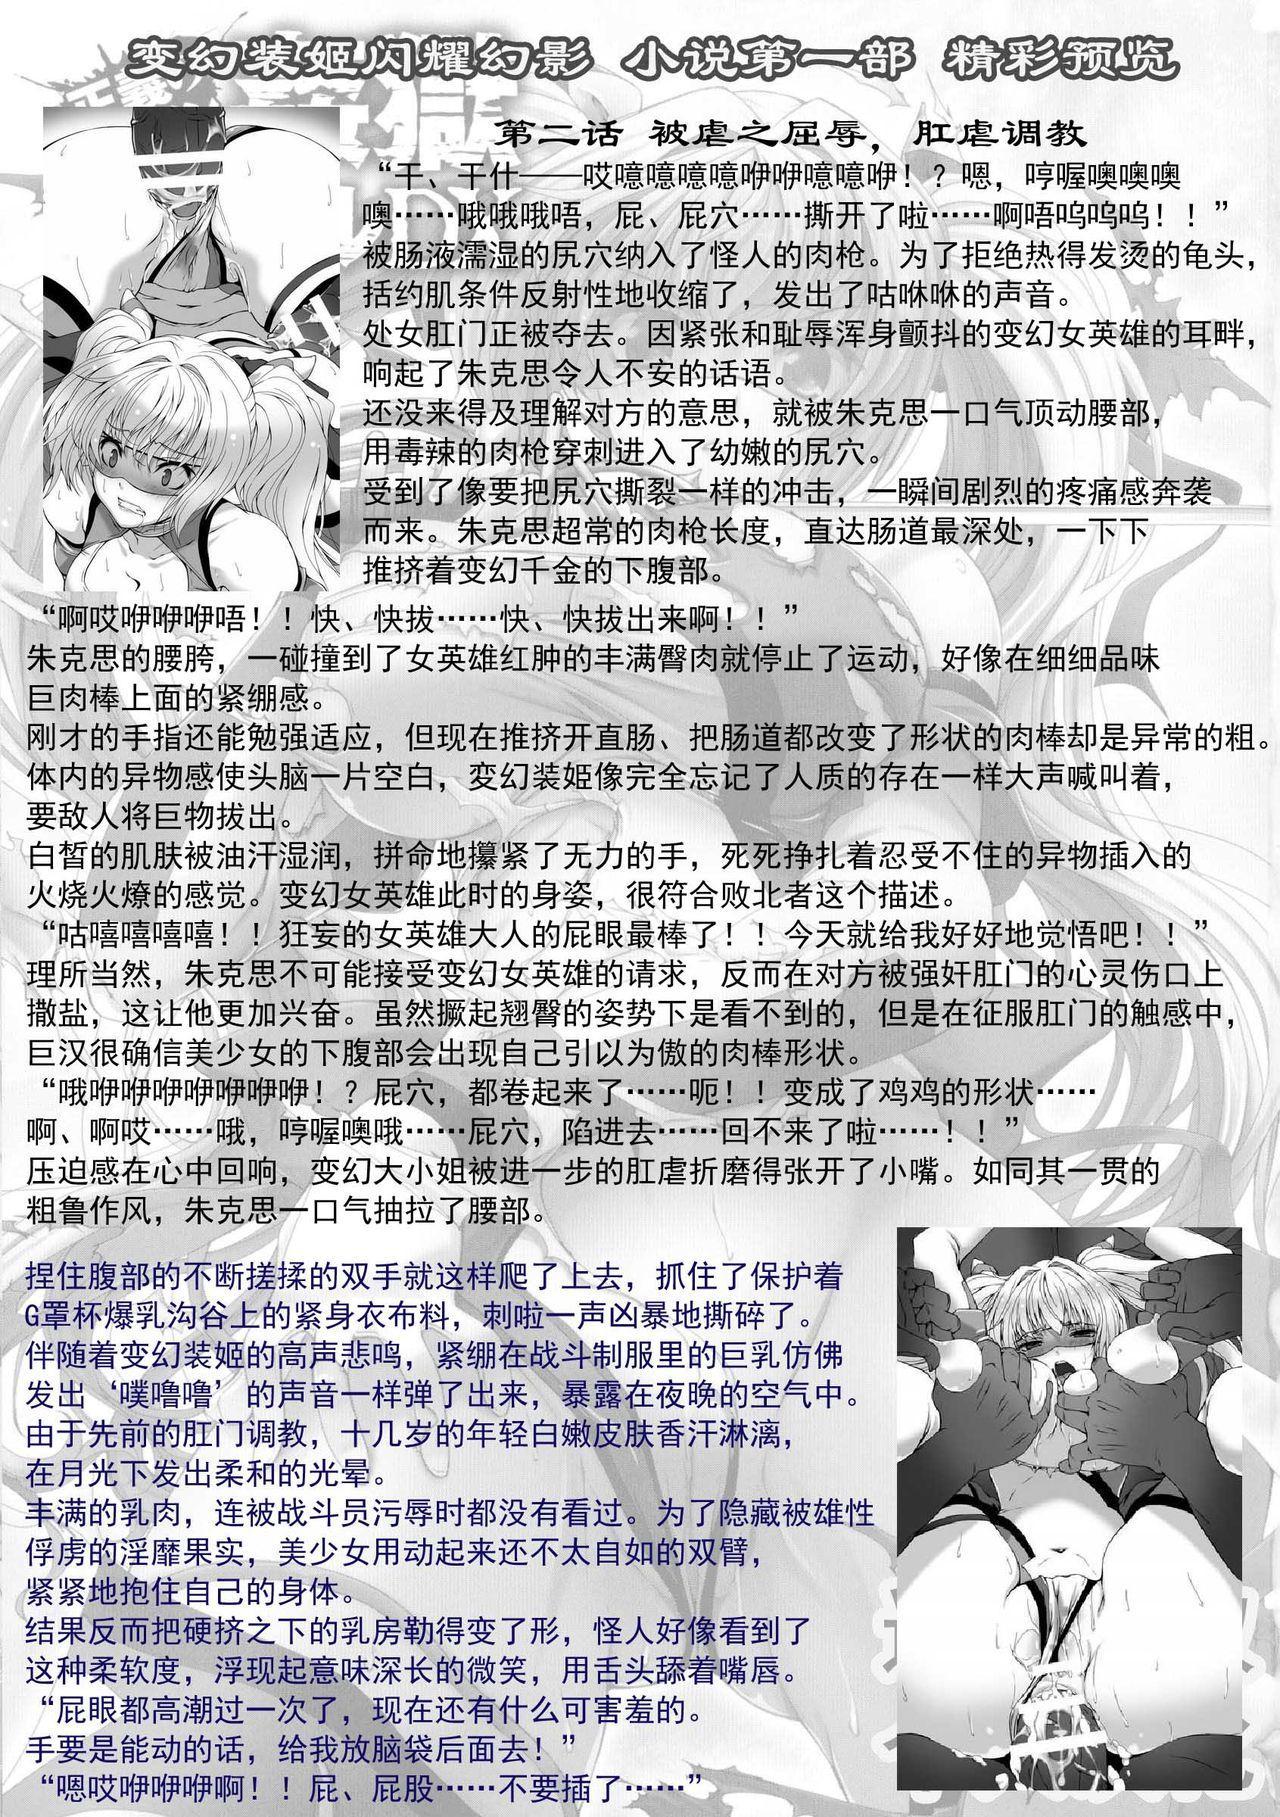 Hengen Souki Shine Mirage THE COMIC EPISODE 1-5 110